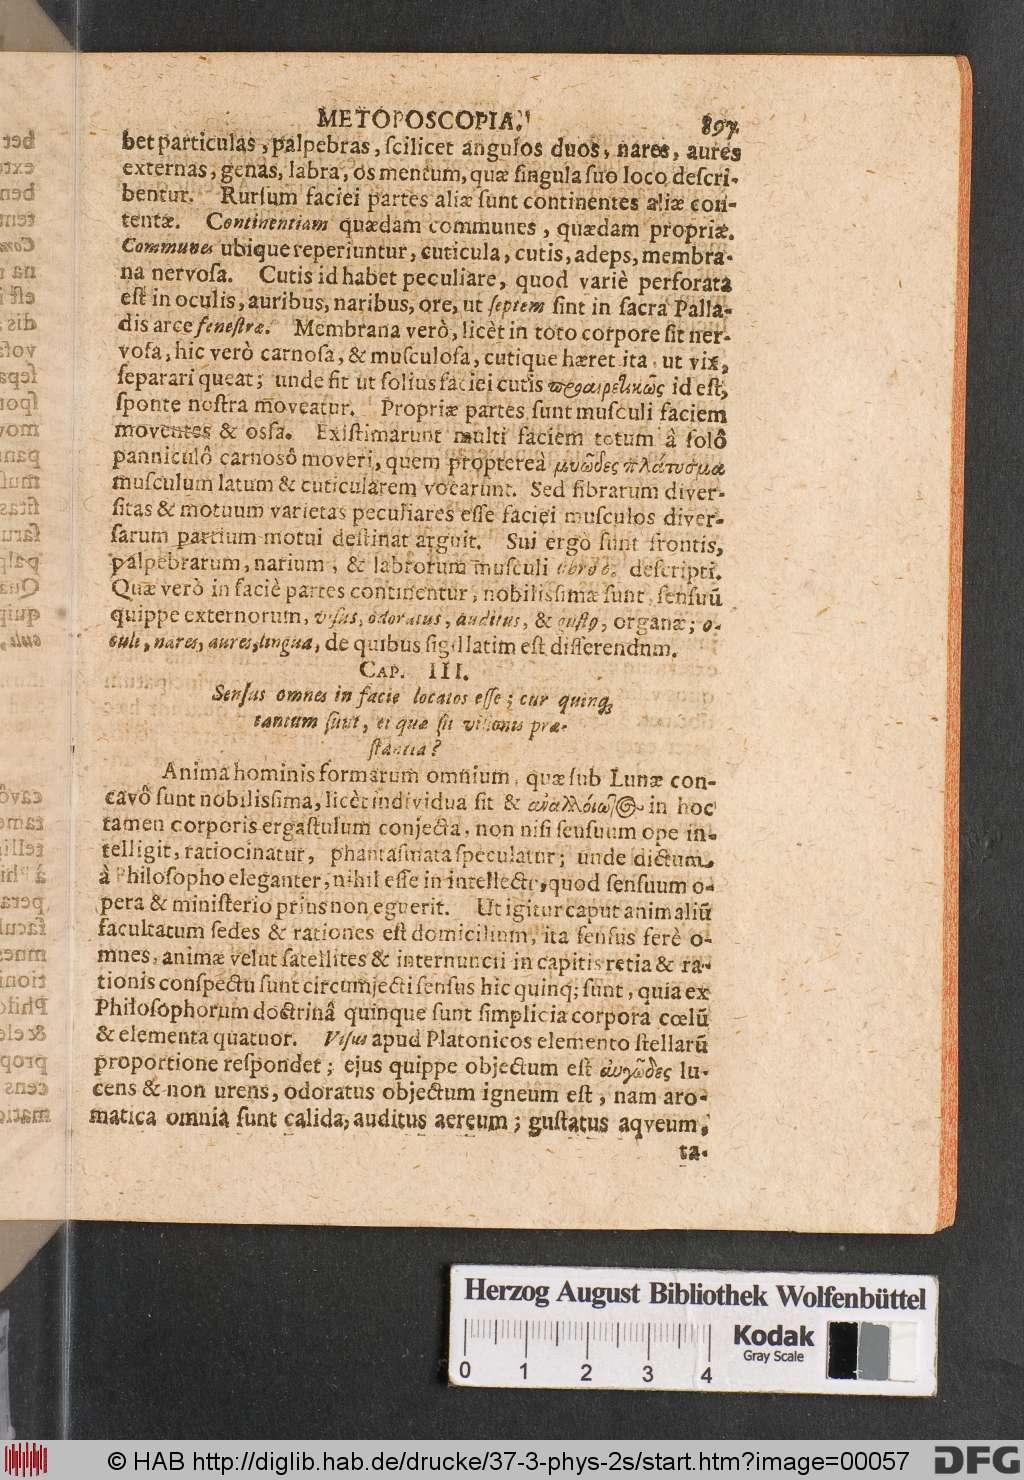 http://diglib.hab.de/drucke/37-3-phys-2s/00057.jpg